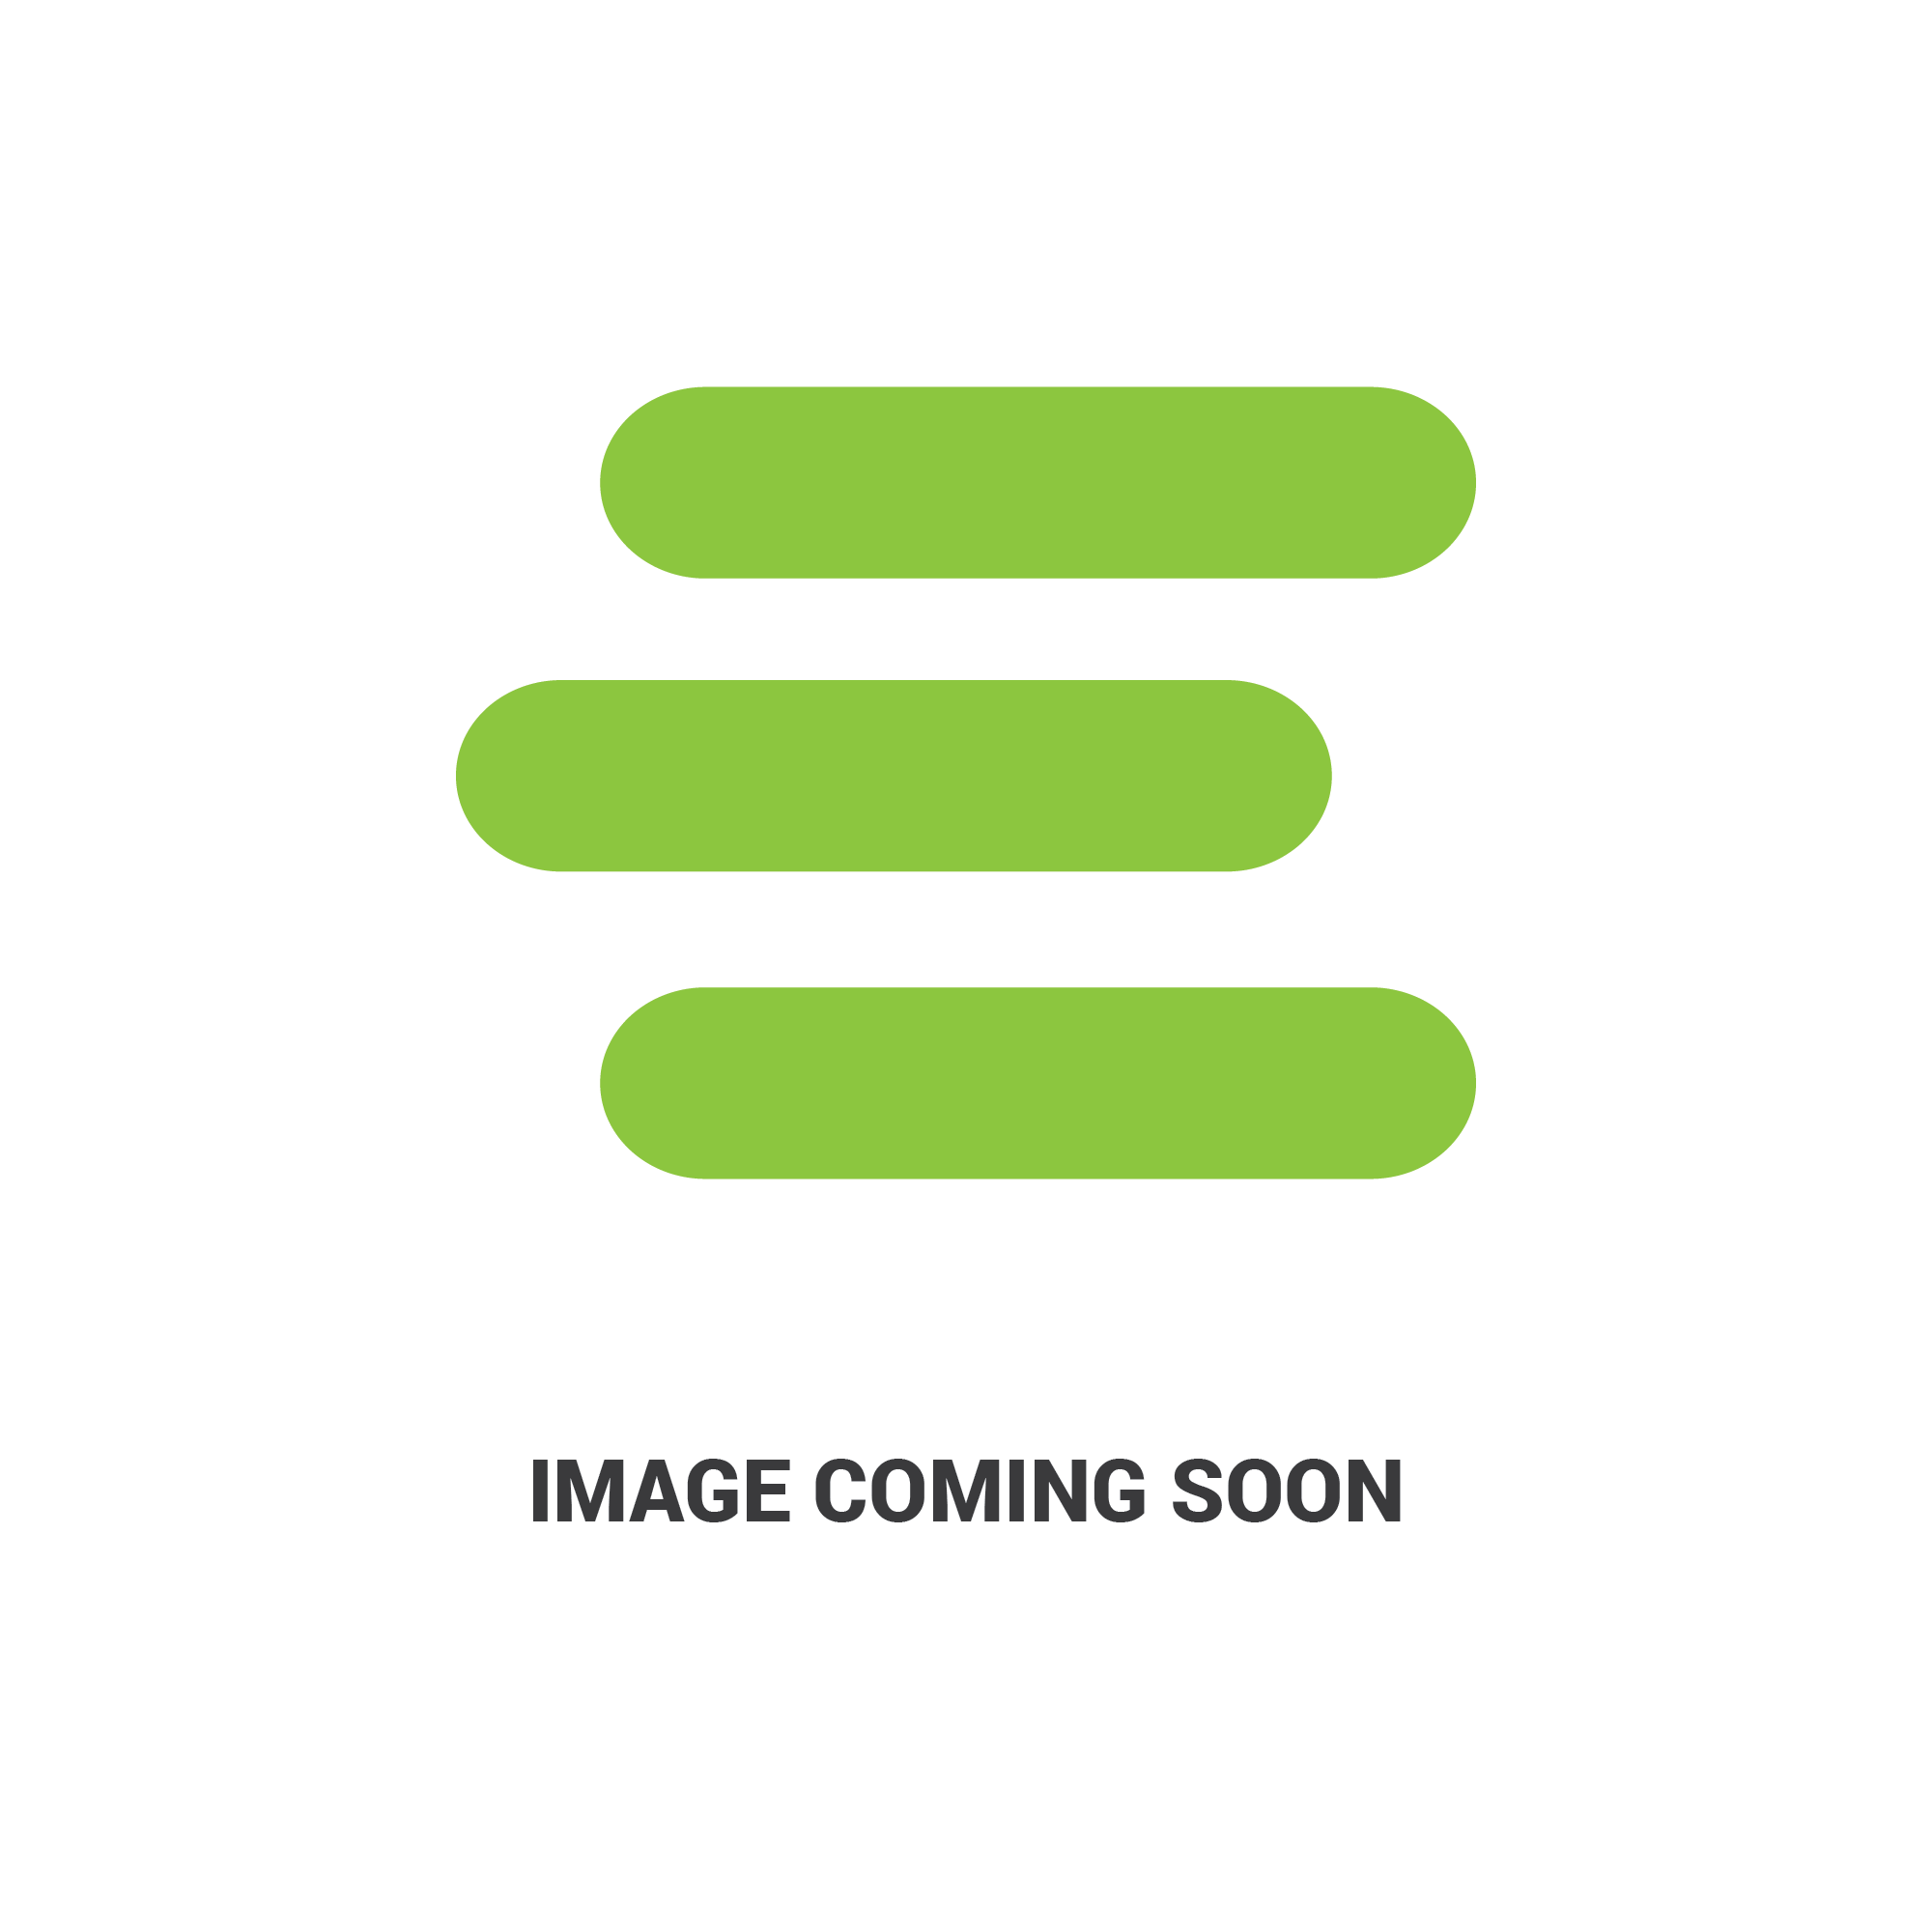 E-6677202edit 1.jpg